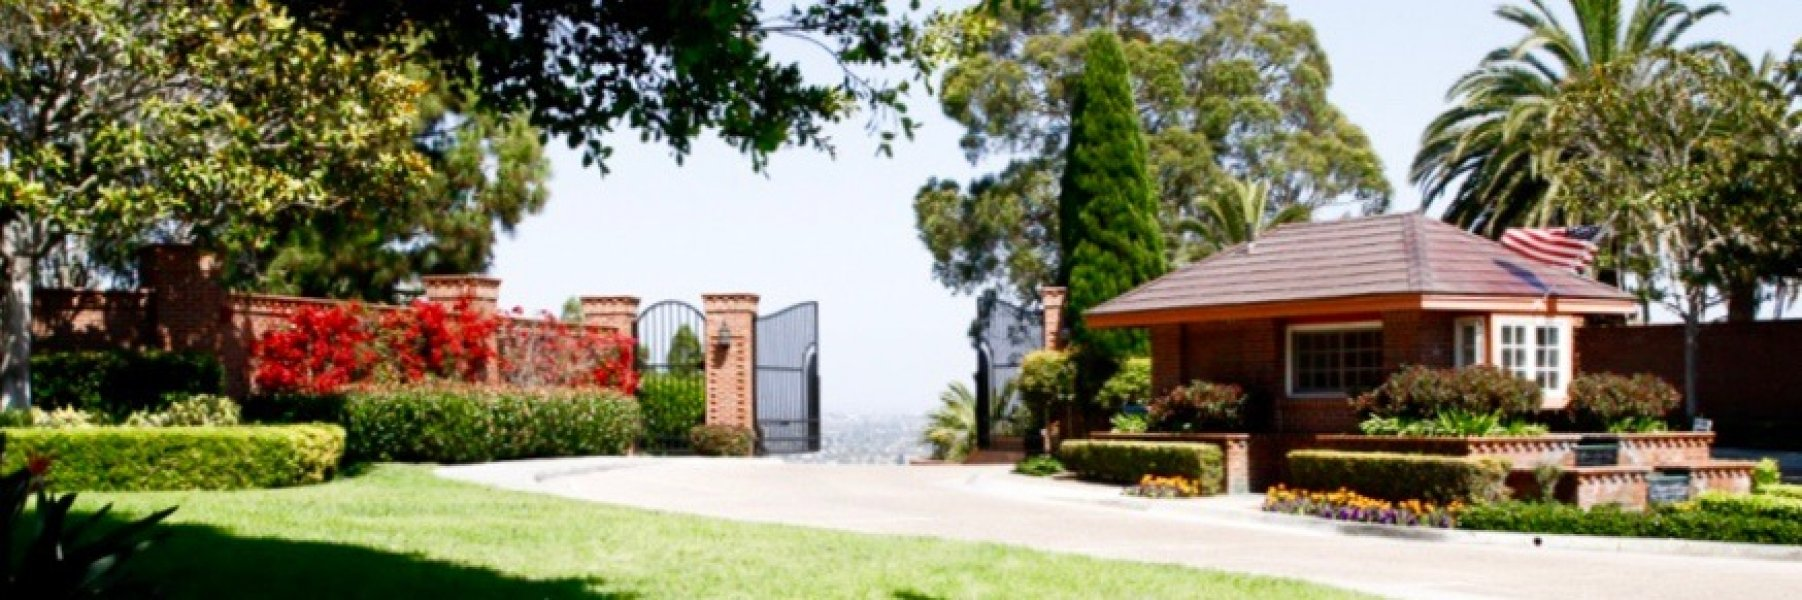 Ridgegate is a community of homes in La Jolla California